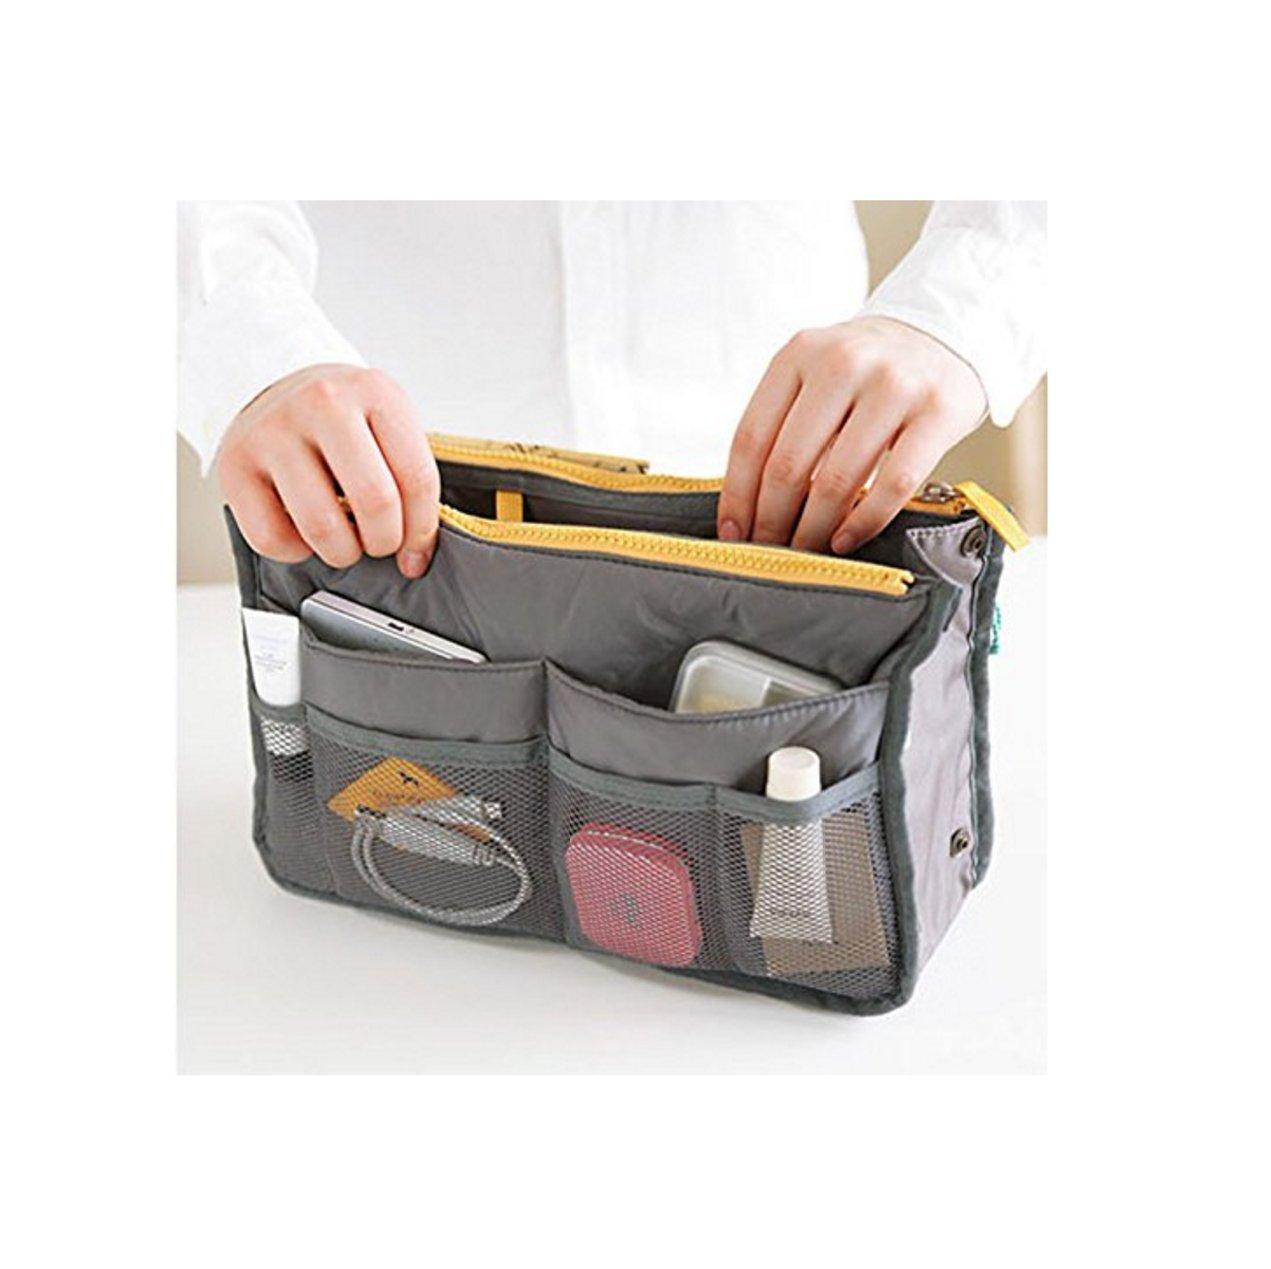 Backpack Organizer Insert Bag Case Multi Pocket Handbag Multi-function Organizer